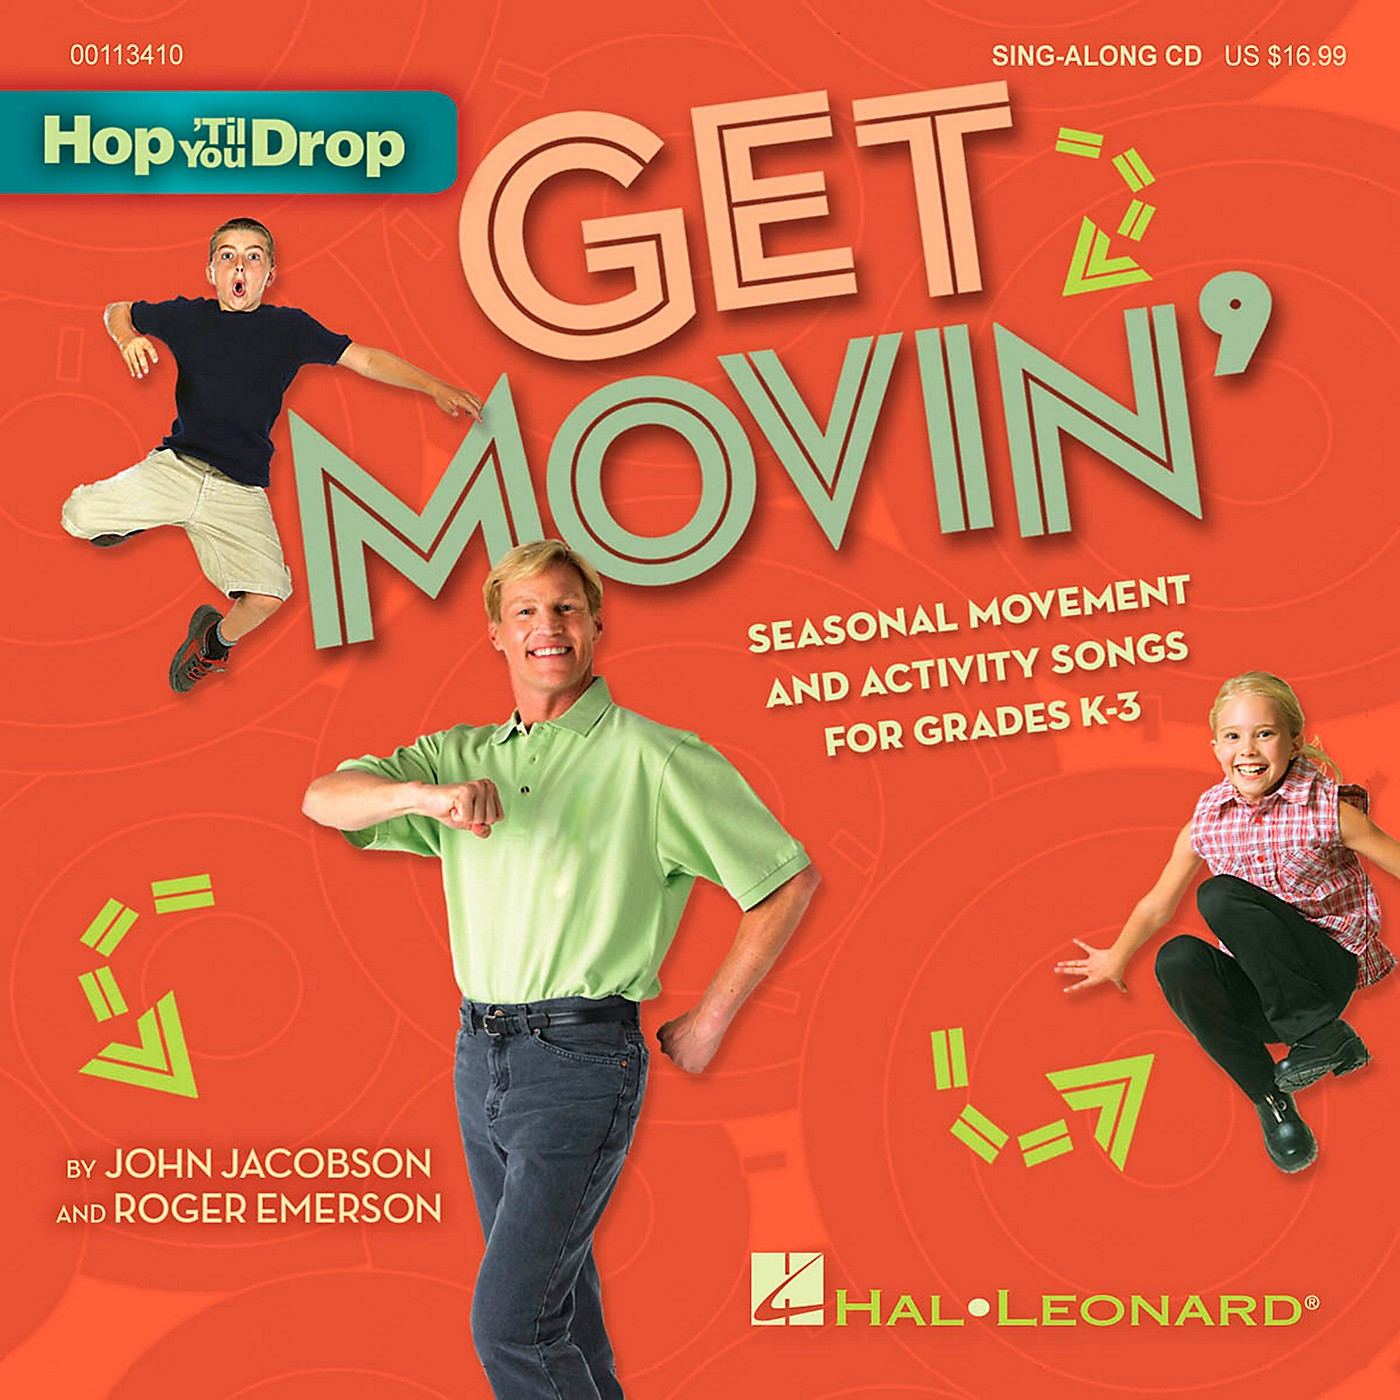 Hal Leonard Get Movin' - Seasonal Movement and Activity Songs for Grades K-3 Book/CD thumbnail